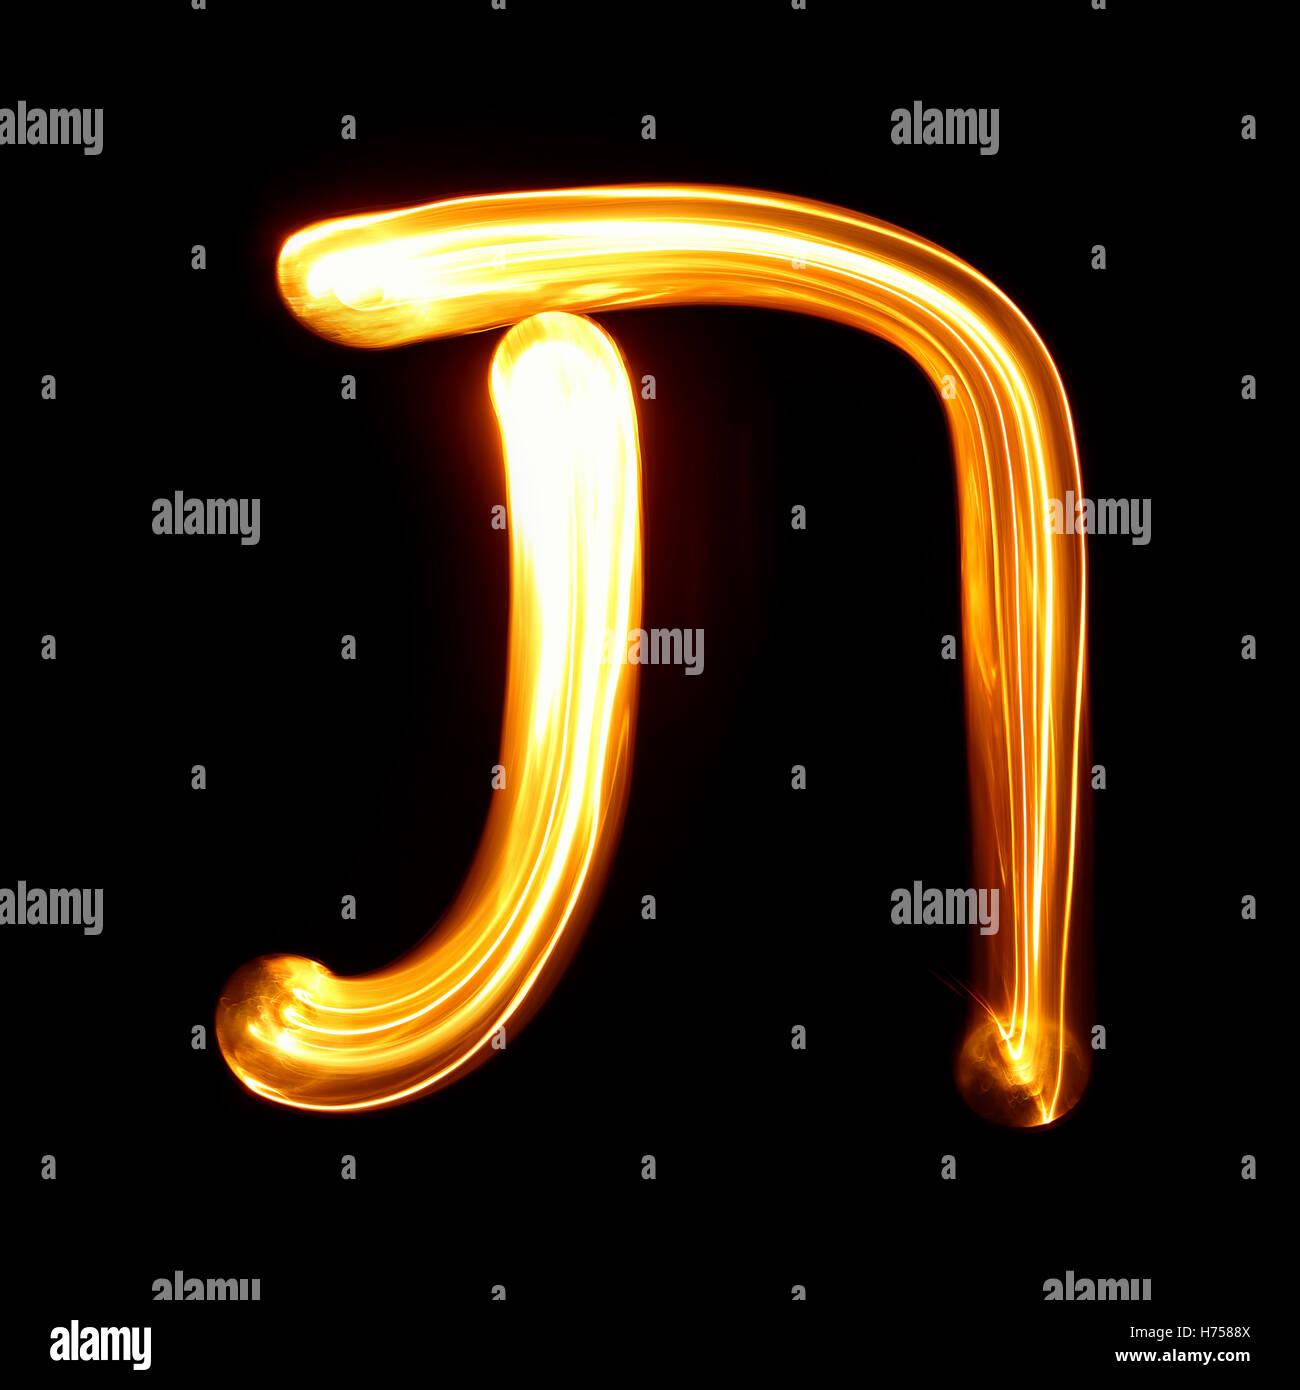 Tav - Letters of hebrew alphabet - Stock Image